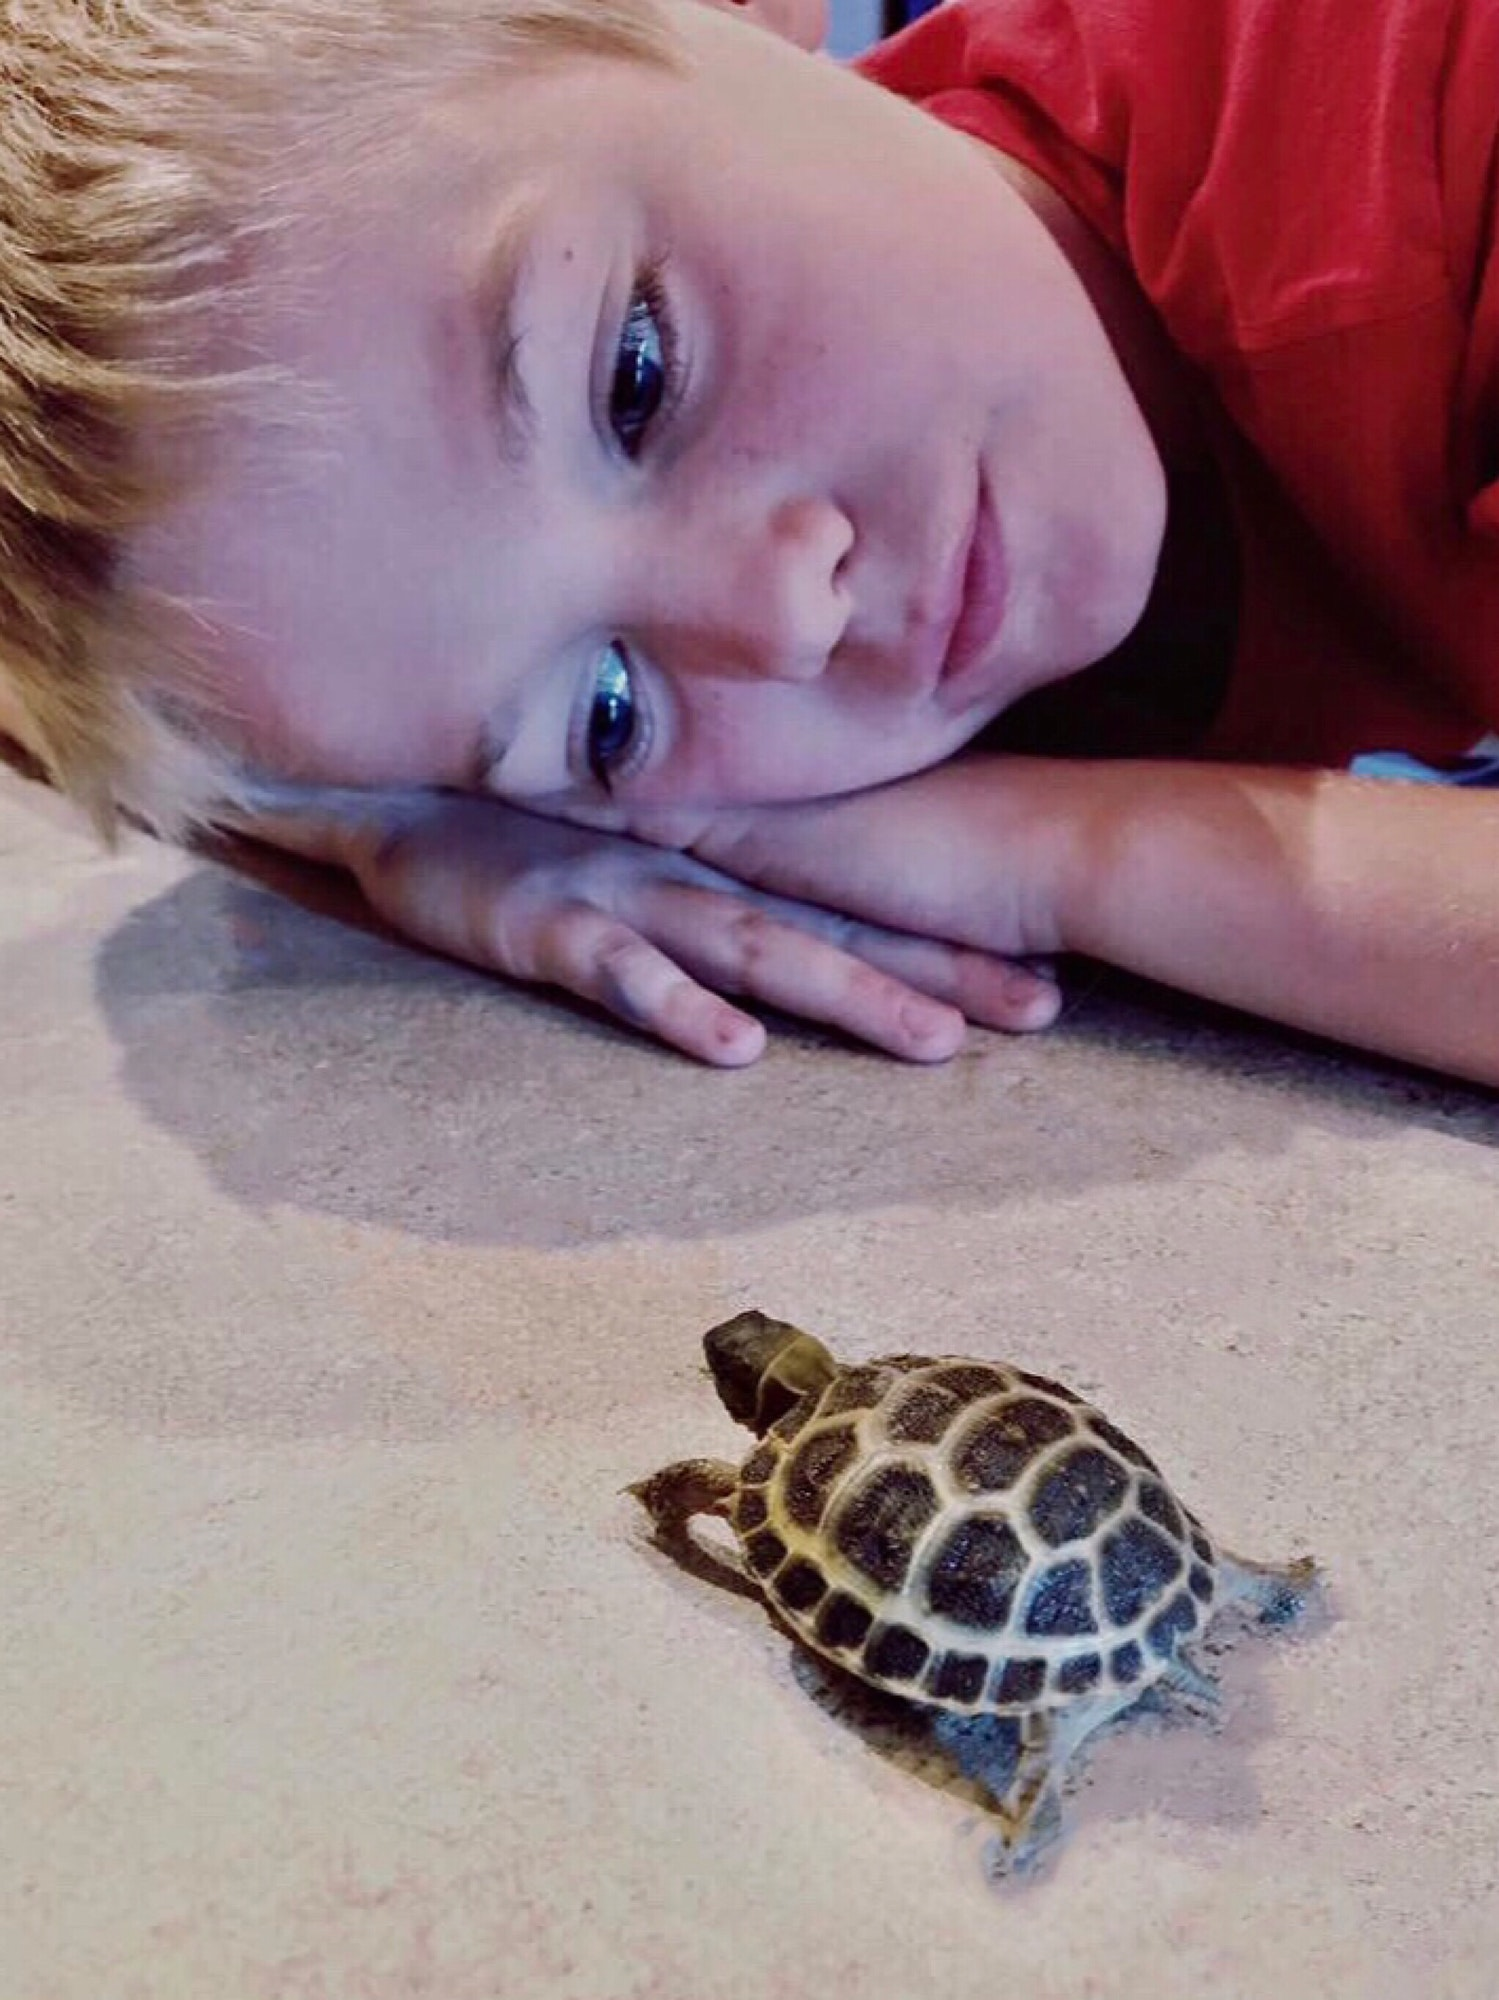 Young boy watching his pet baby turtle walk towards him!